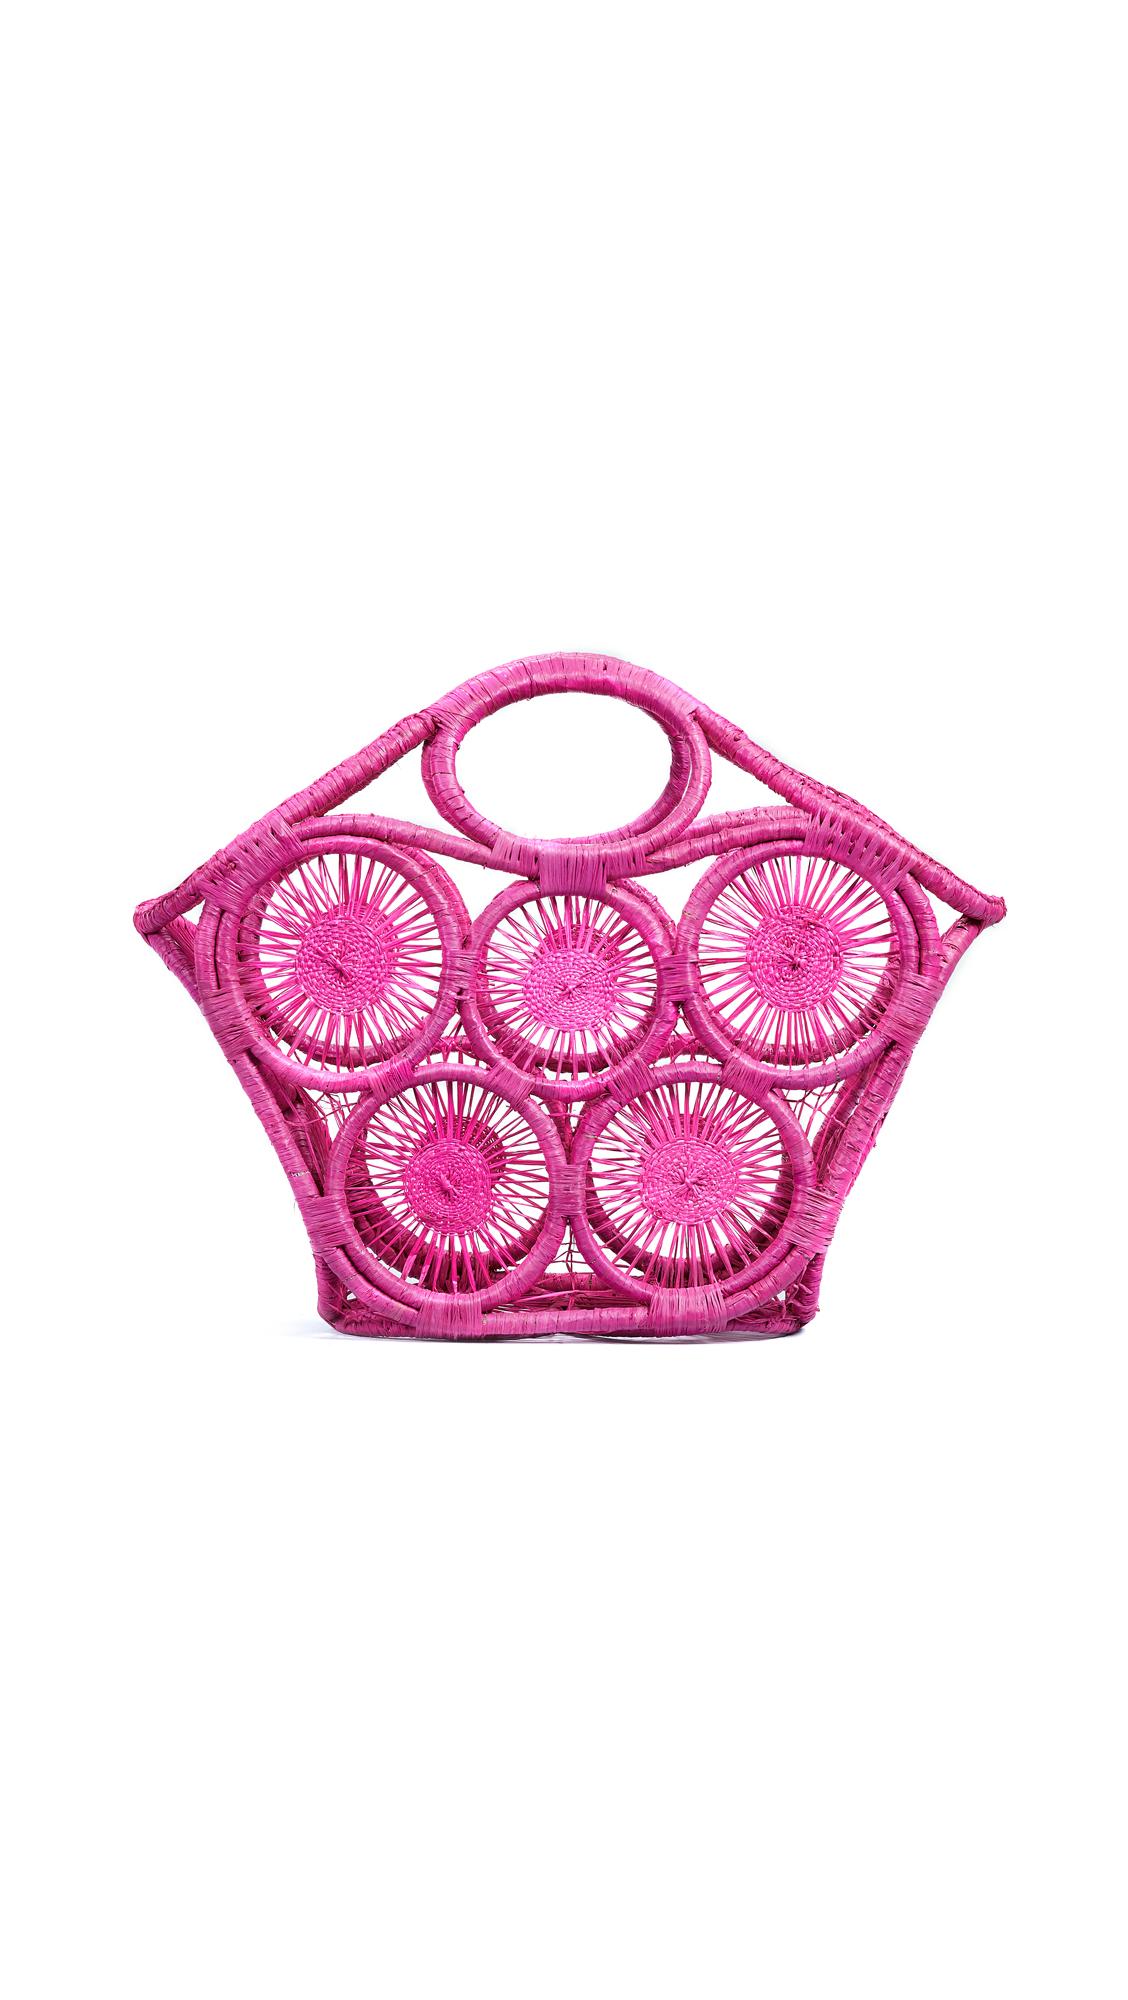 Fortaleza Open Weave Tote, Pink